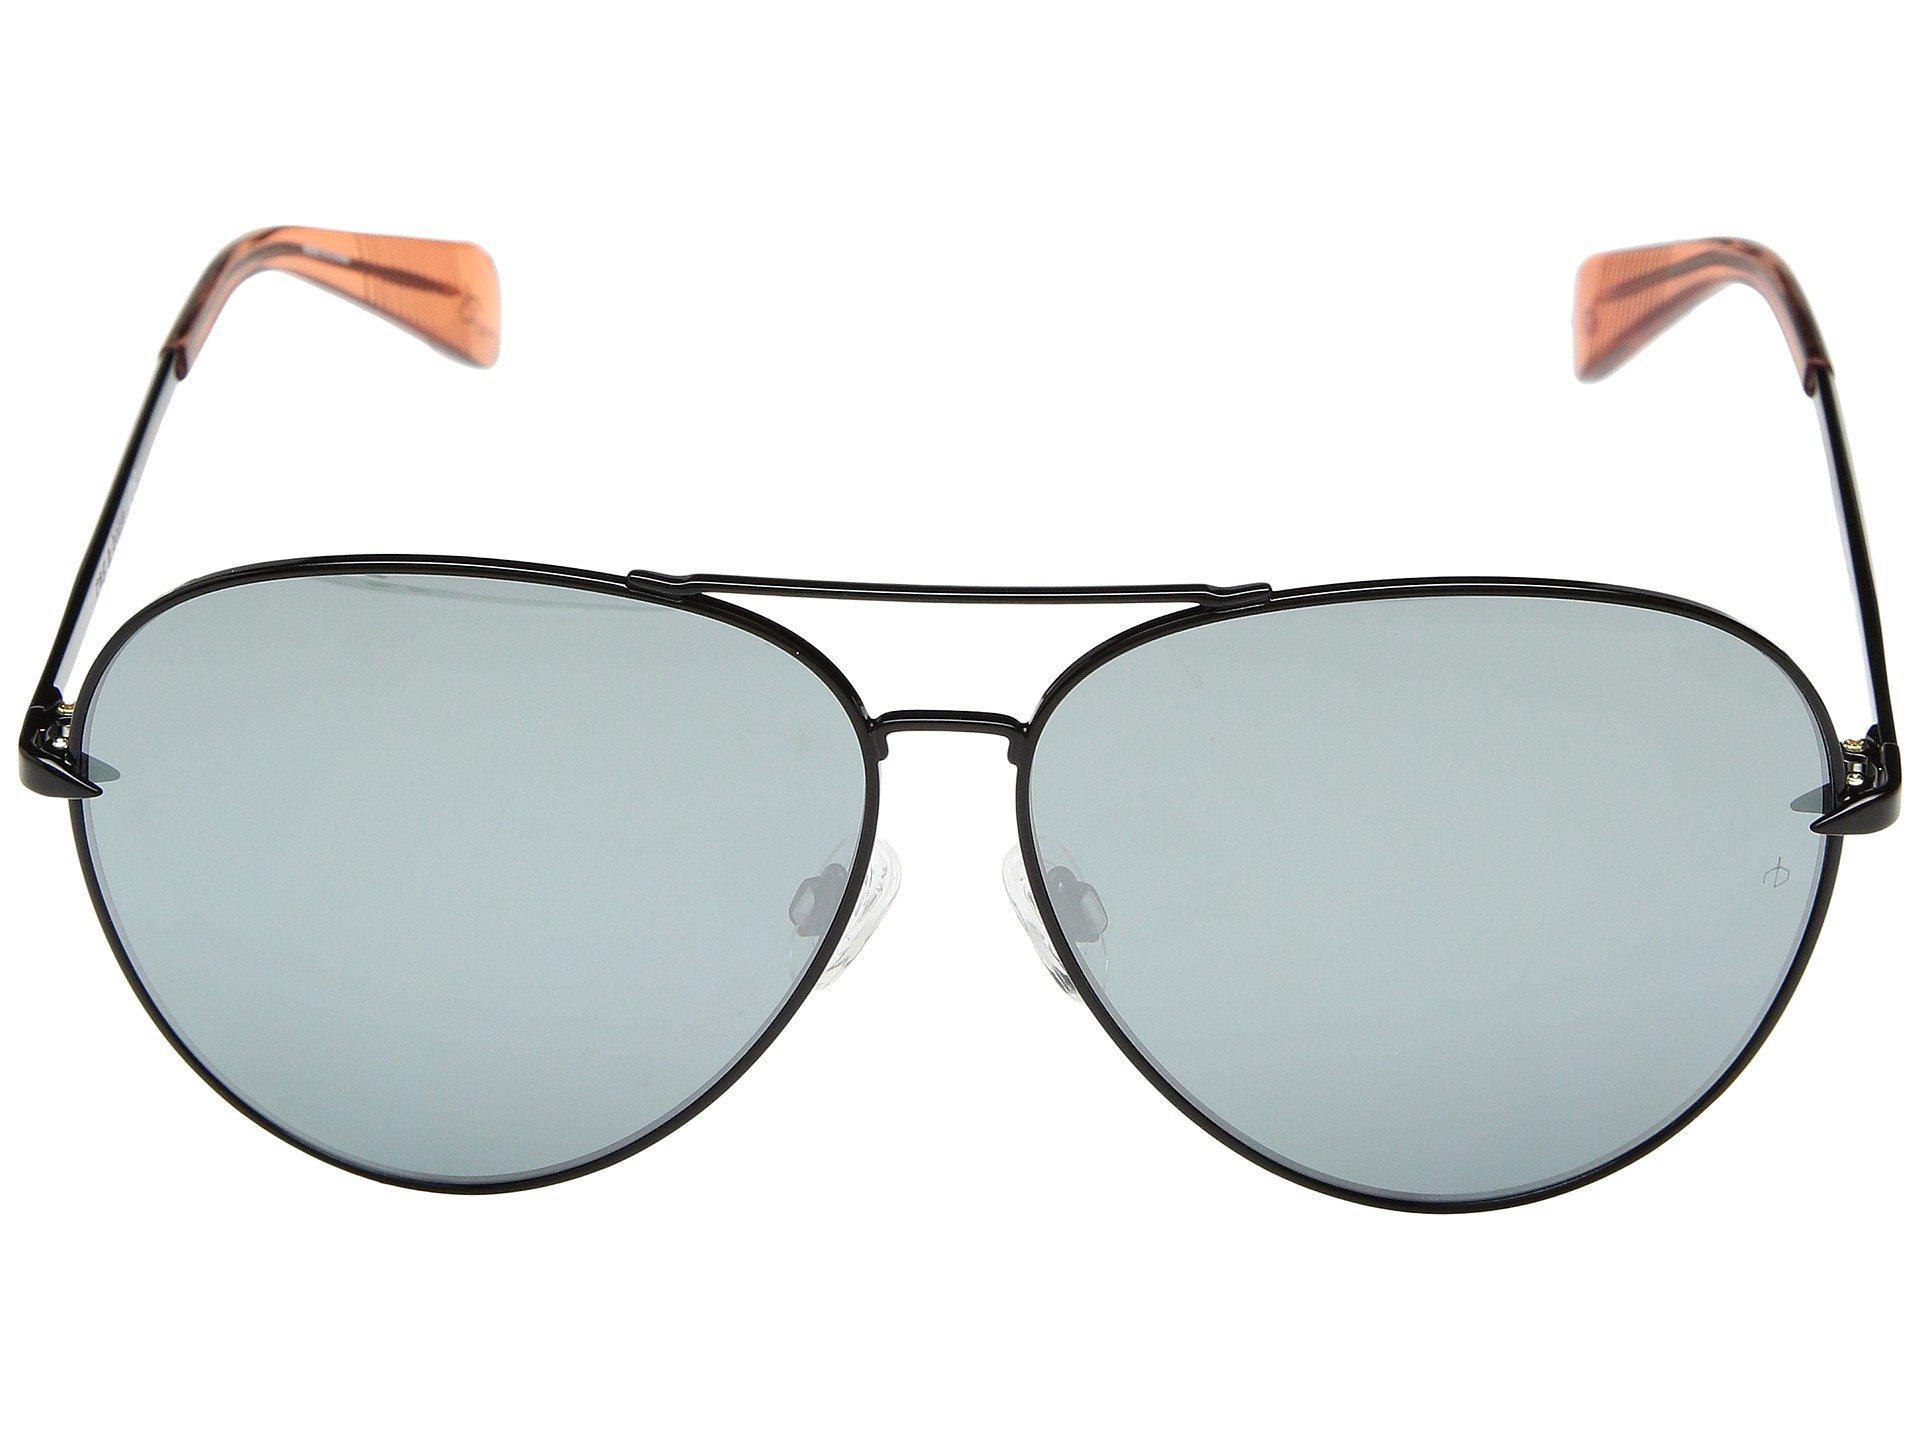 bb98e1191a9 Rag   Bone - Rnb1006 s (black grey) Fashion Sunglasses - Lyst. View  fullscreen